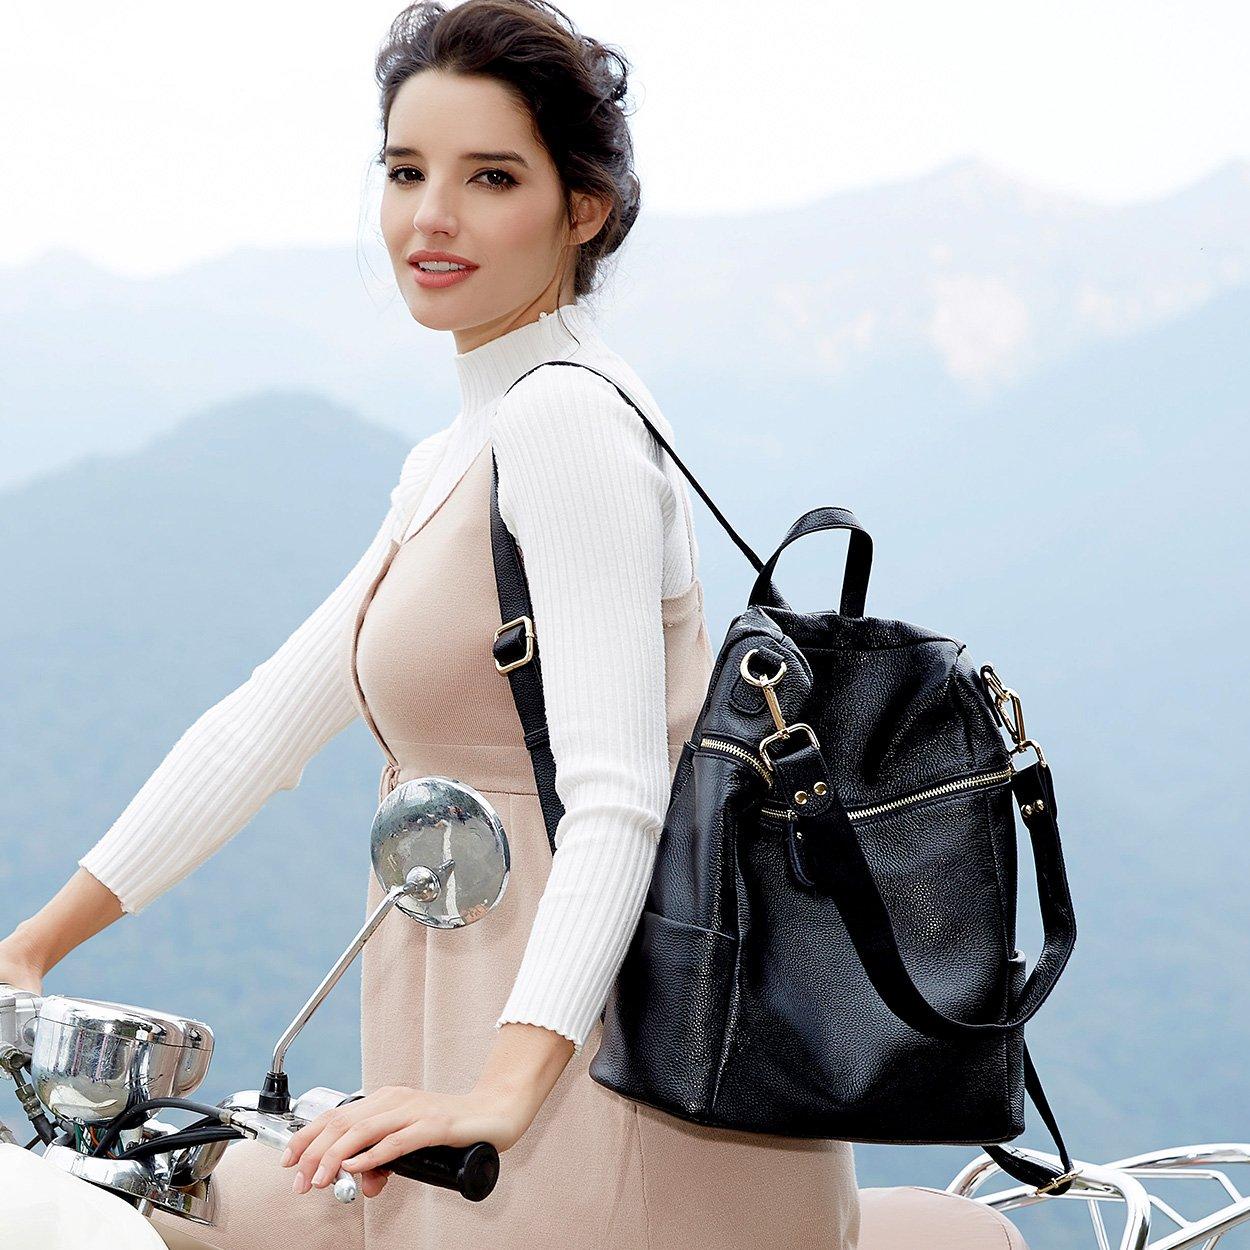 BOYATU Convertible Genuine Leather Backpack Purse for Women Fashion Travel Bag (Black) by BOYATU (Image #7)